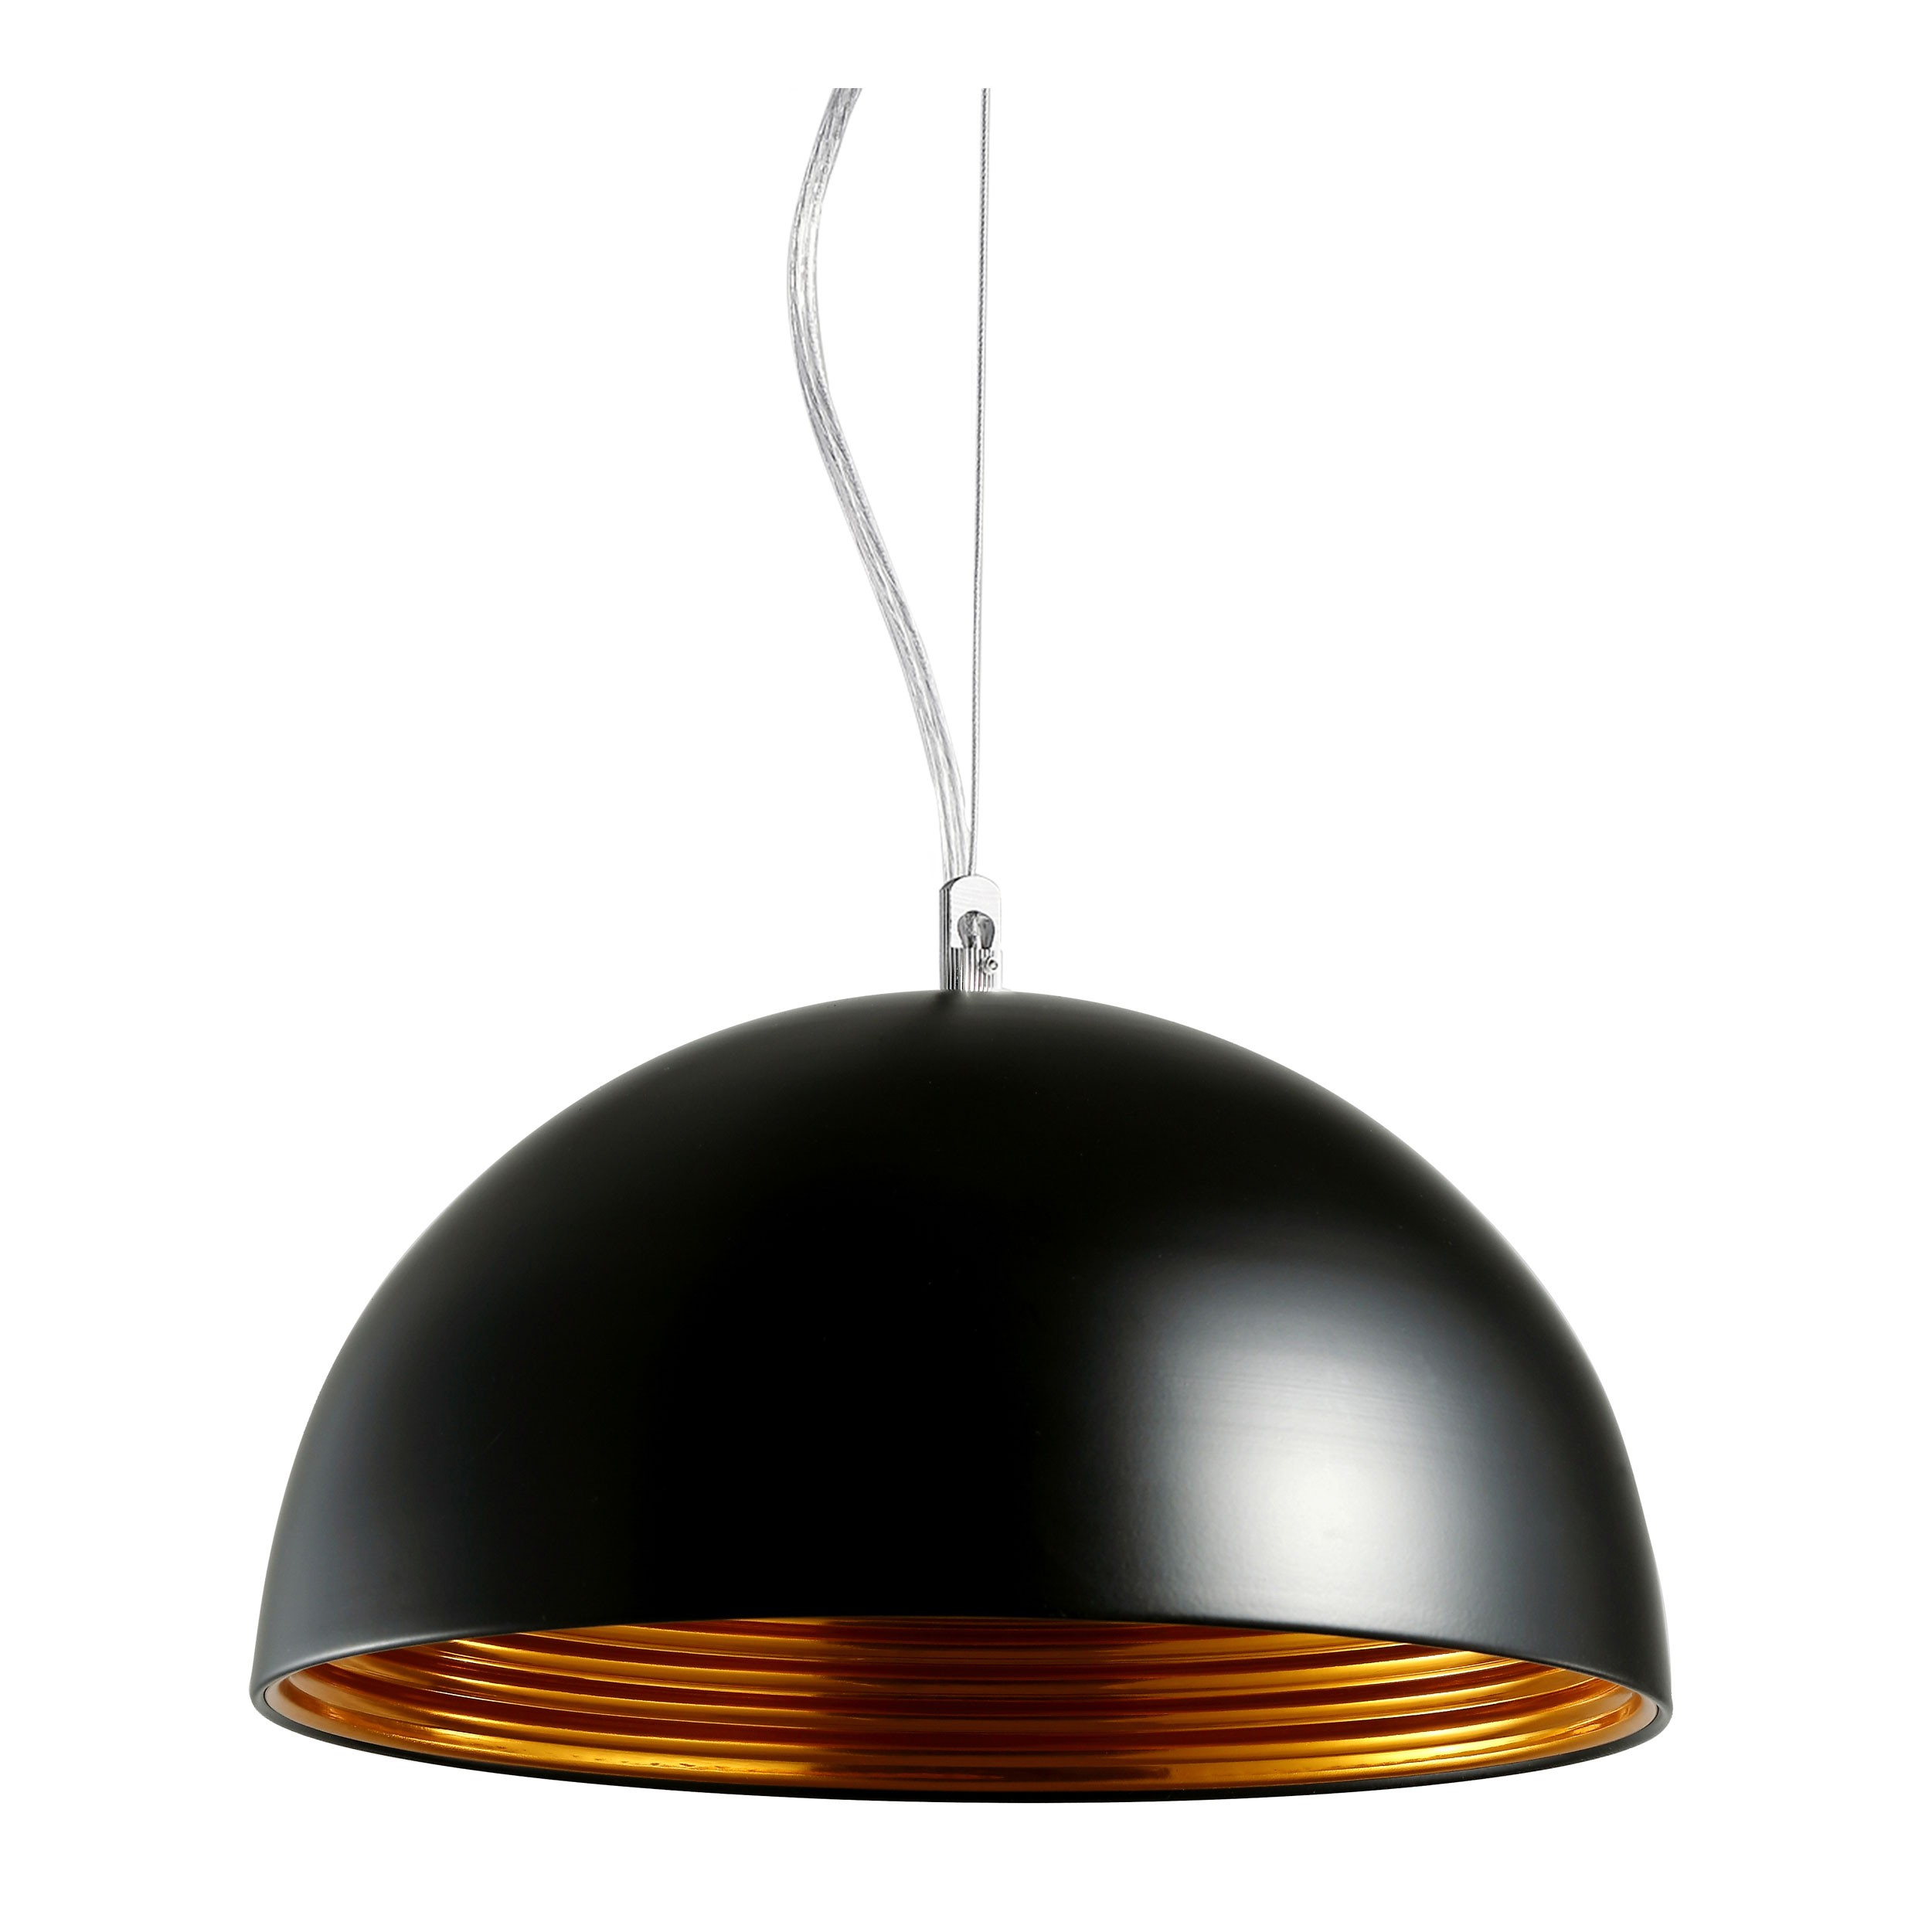 suspension studio noire et or l choisissez nos suspensions studio noires et or l rdv d co. Black Bedroom Furniture Sets. Home Design Ideas